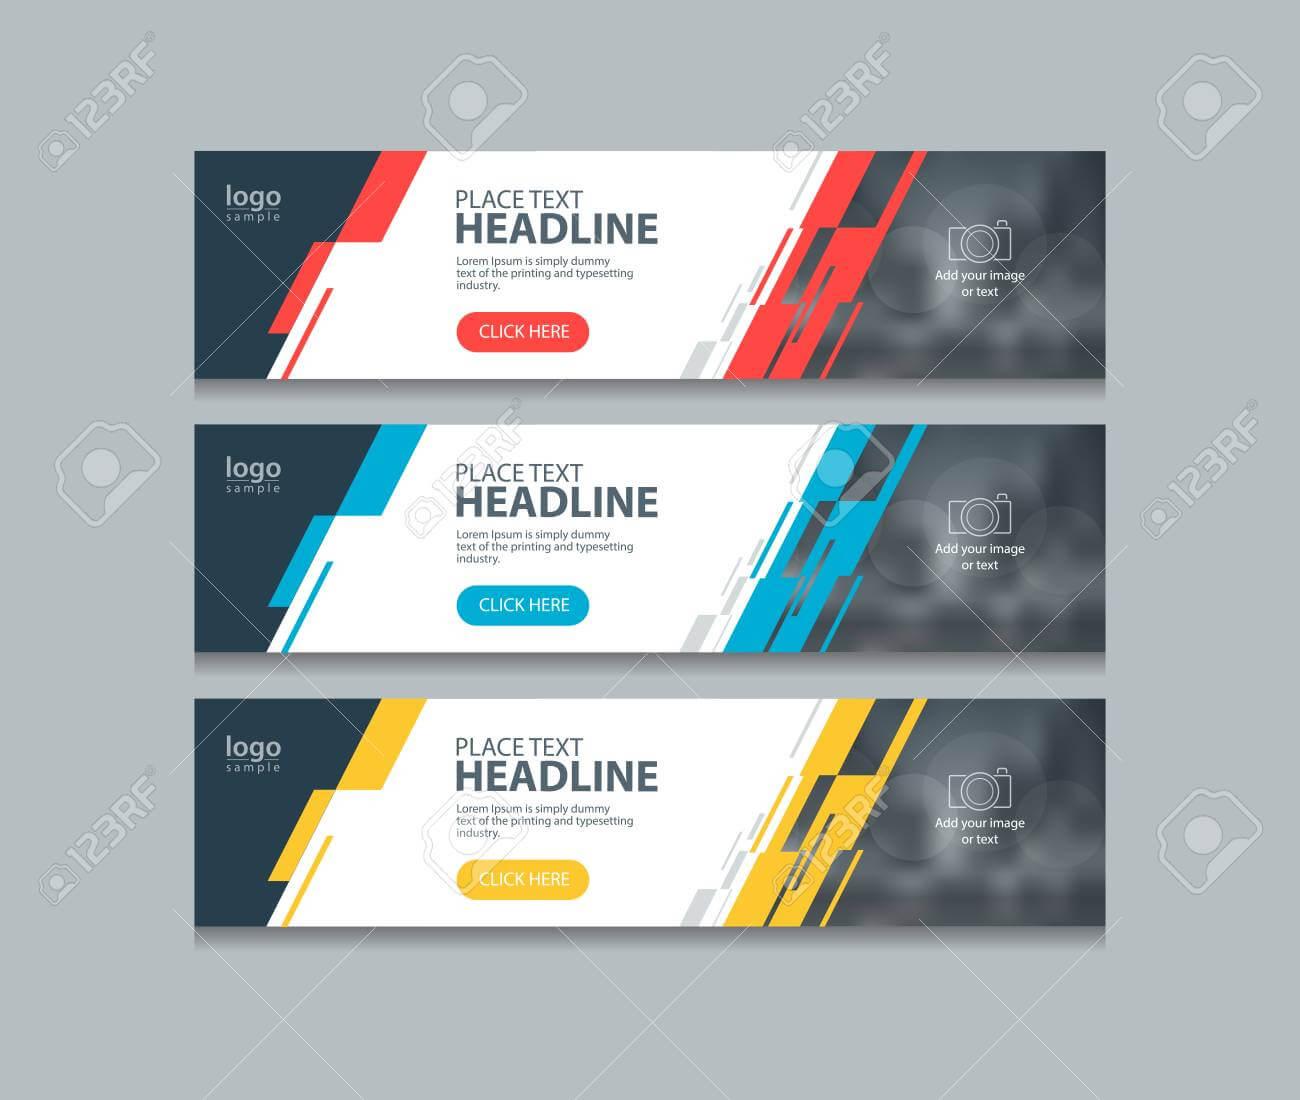 Abstract Horizontal Web Banner Design Template Backgrounds Regarding Website Banner Design Templates